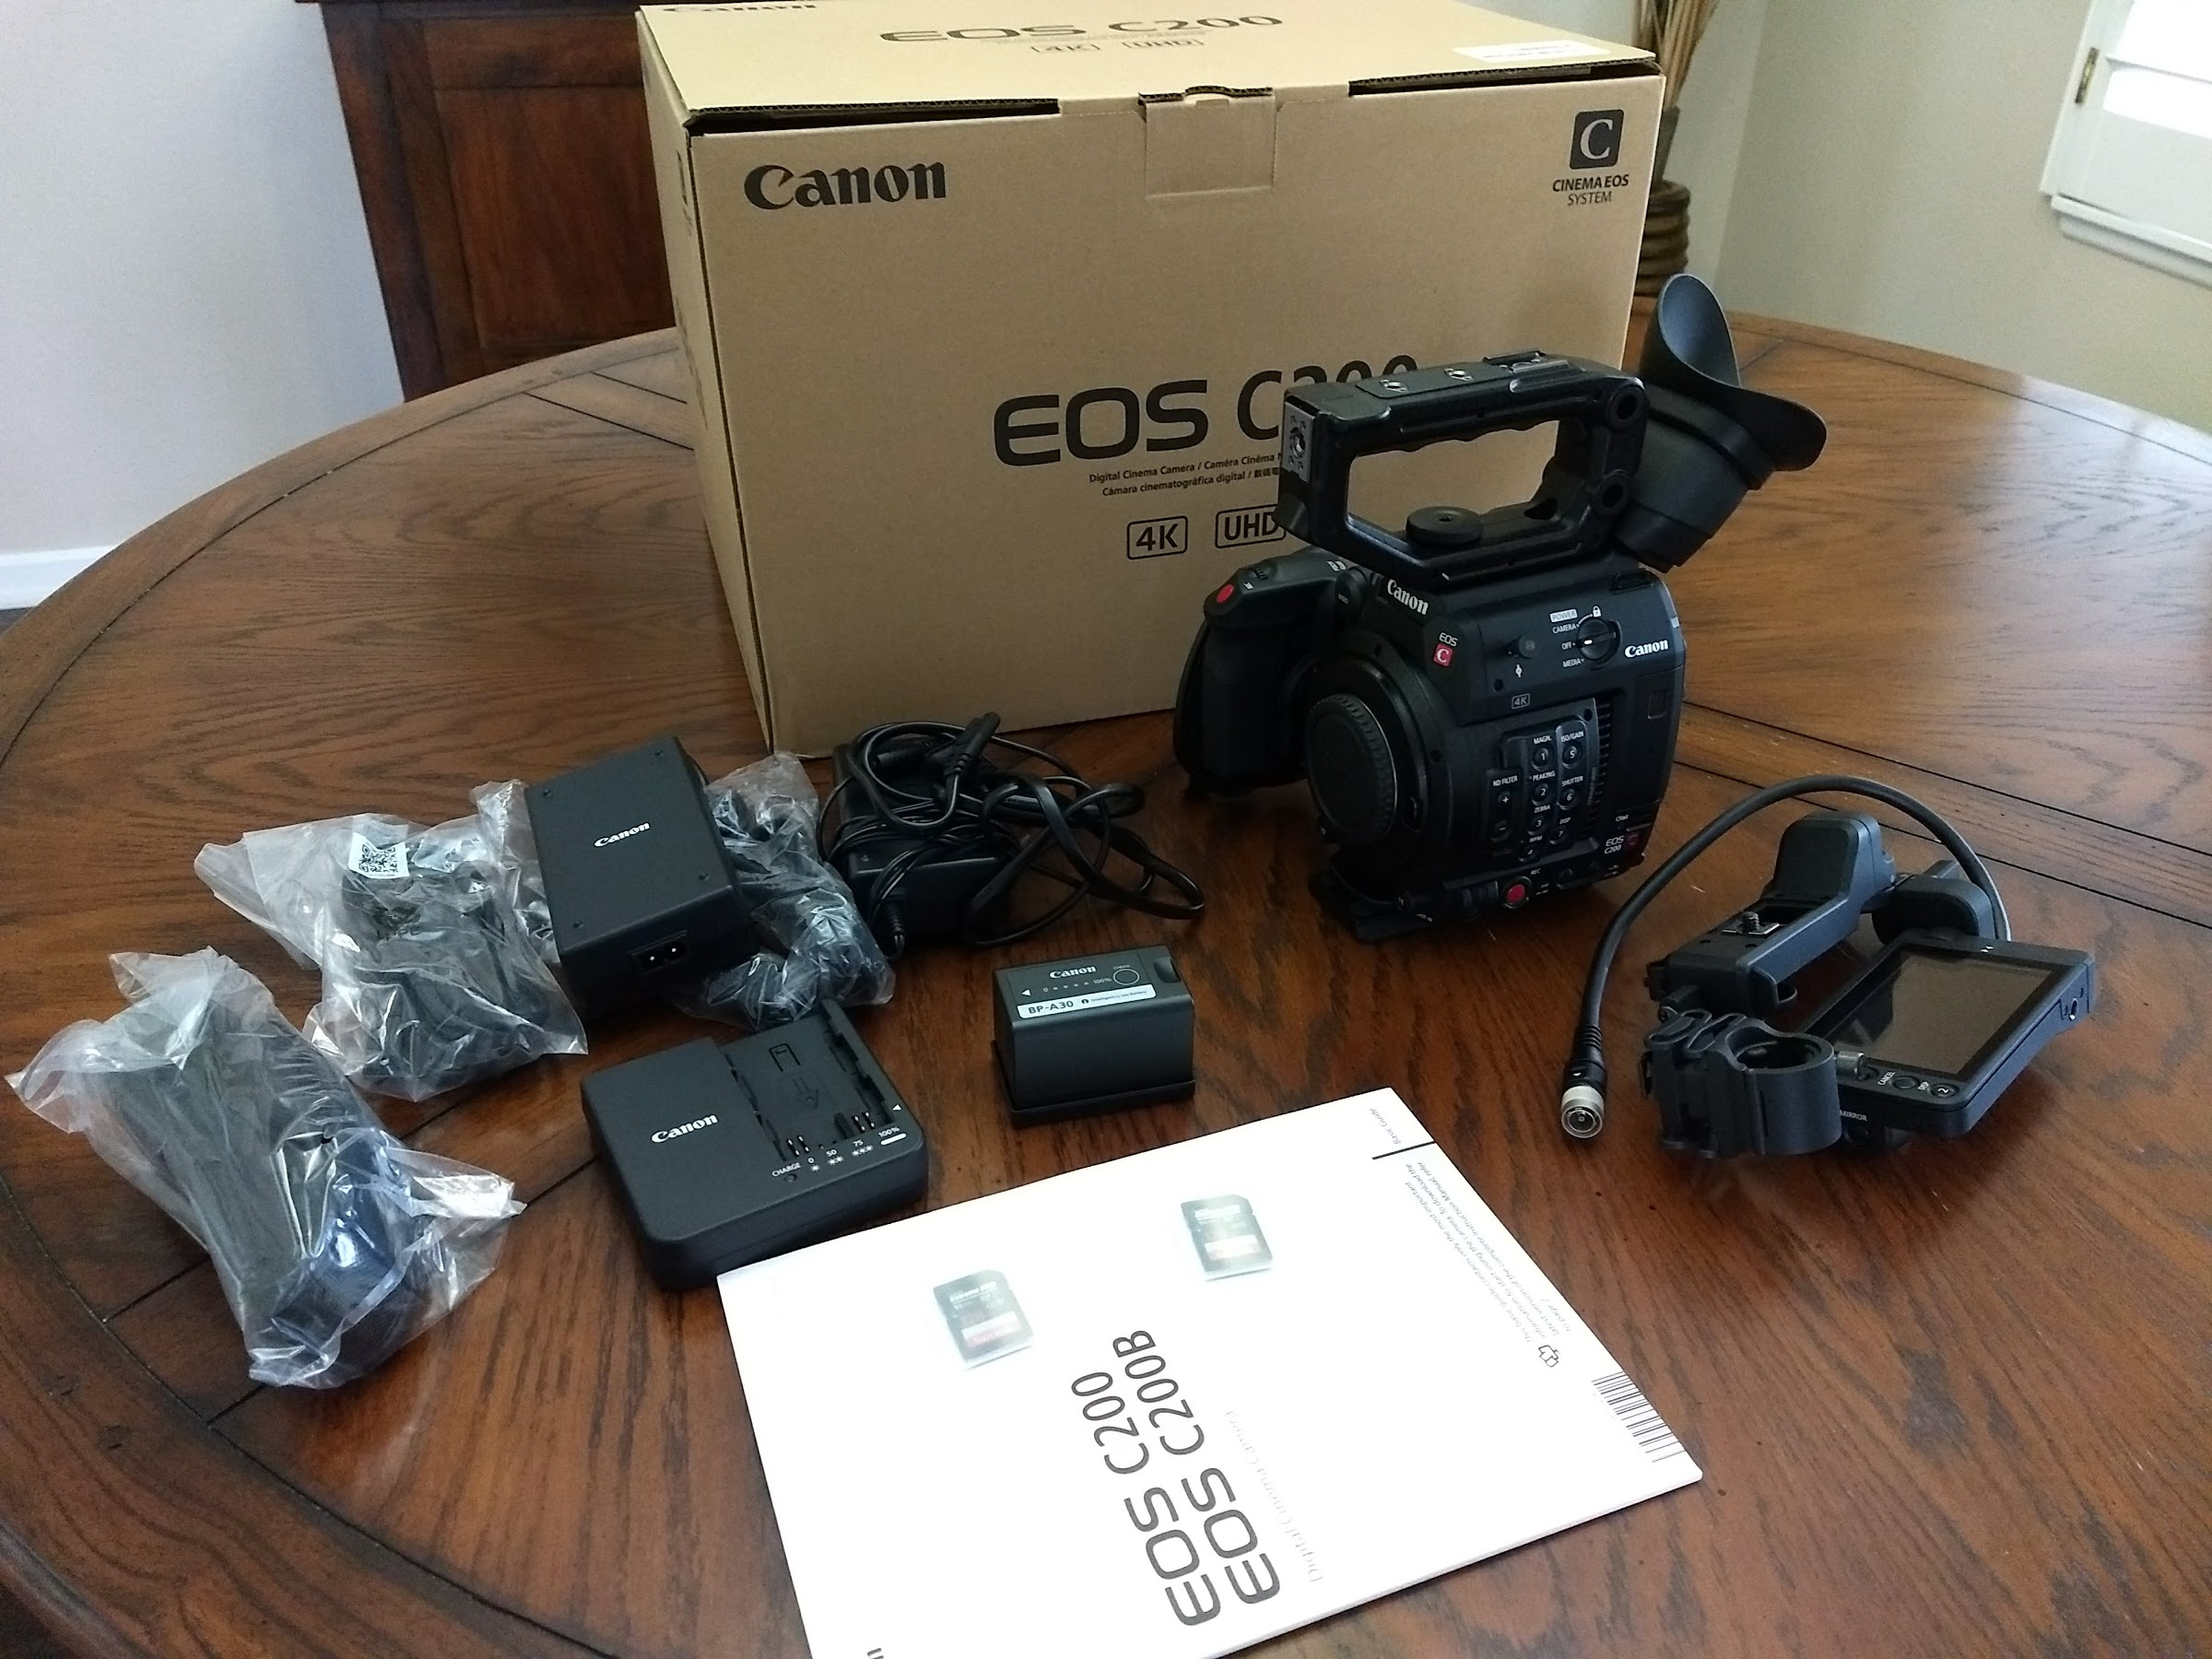 FS-CONUS: Canon C200 MINT as NEW (Open Box)! From Canon